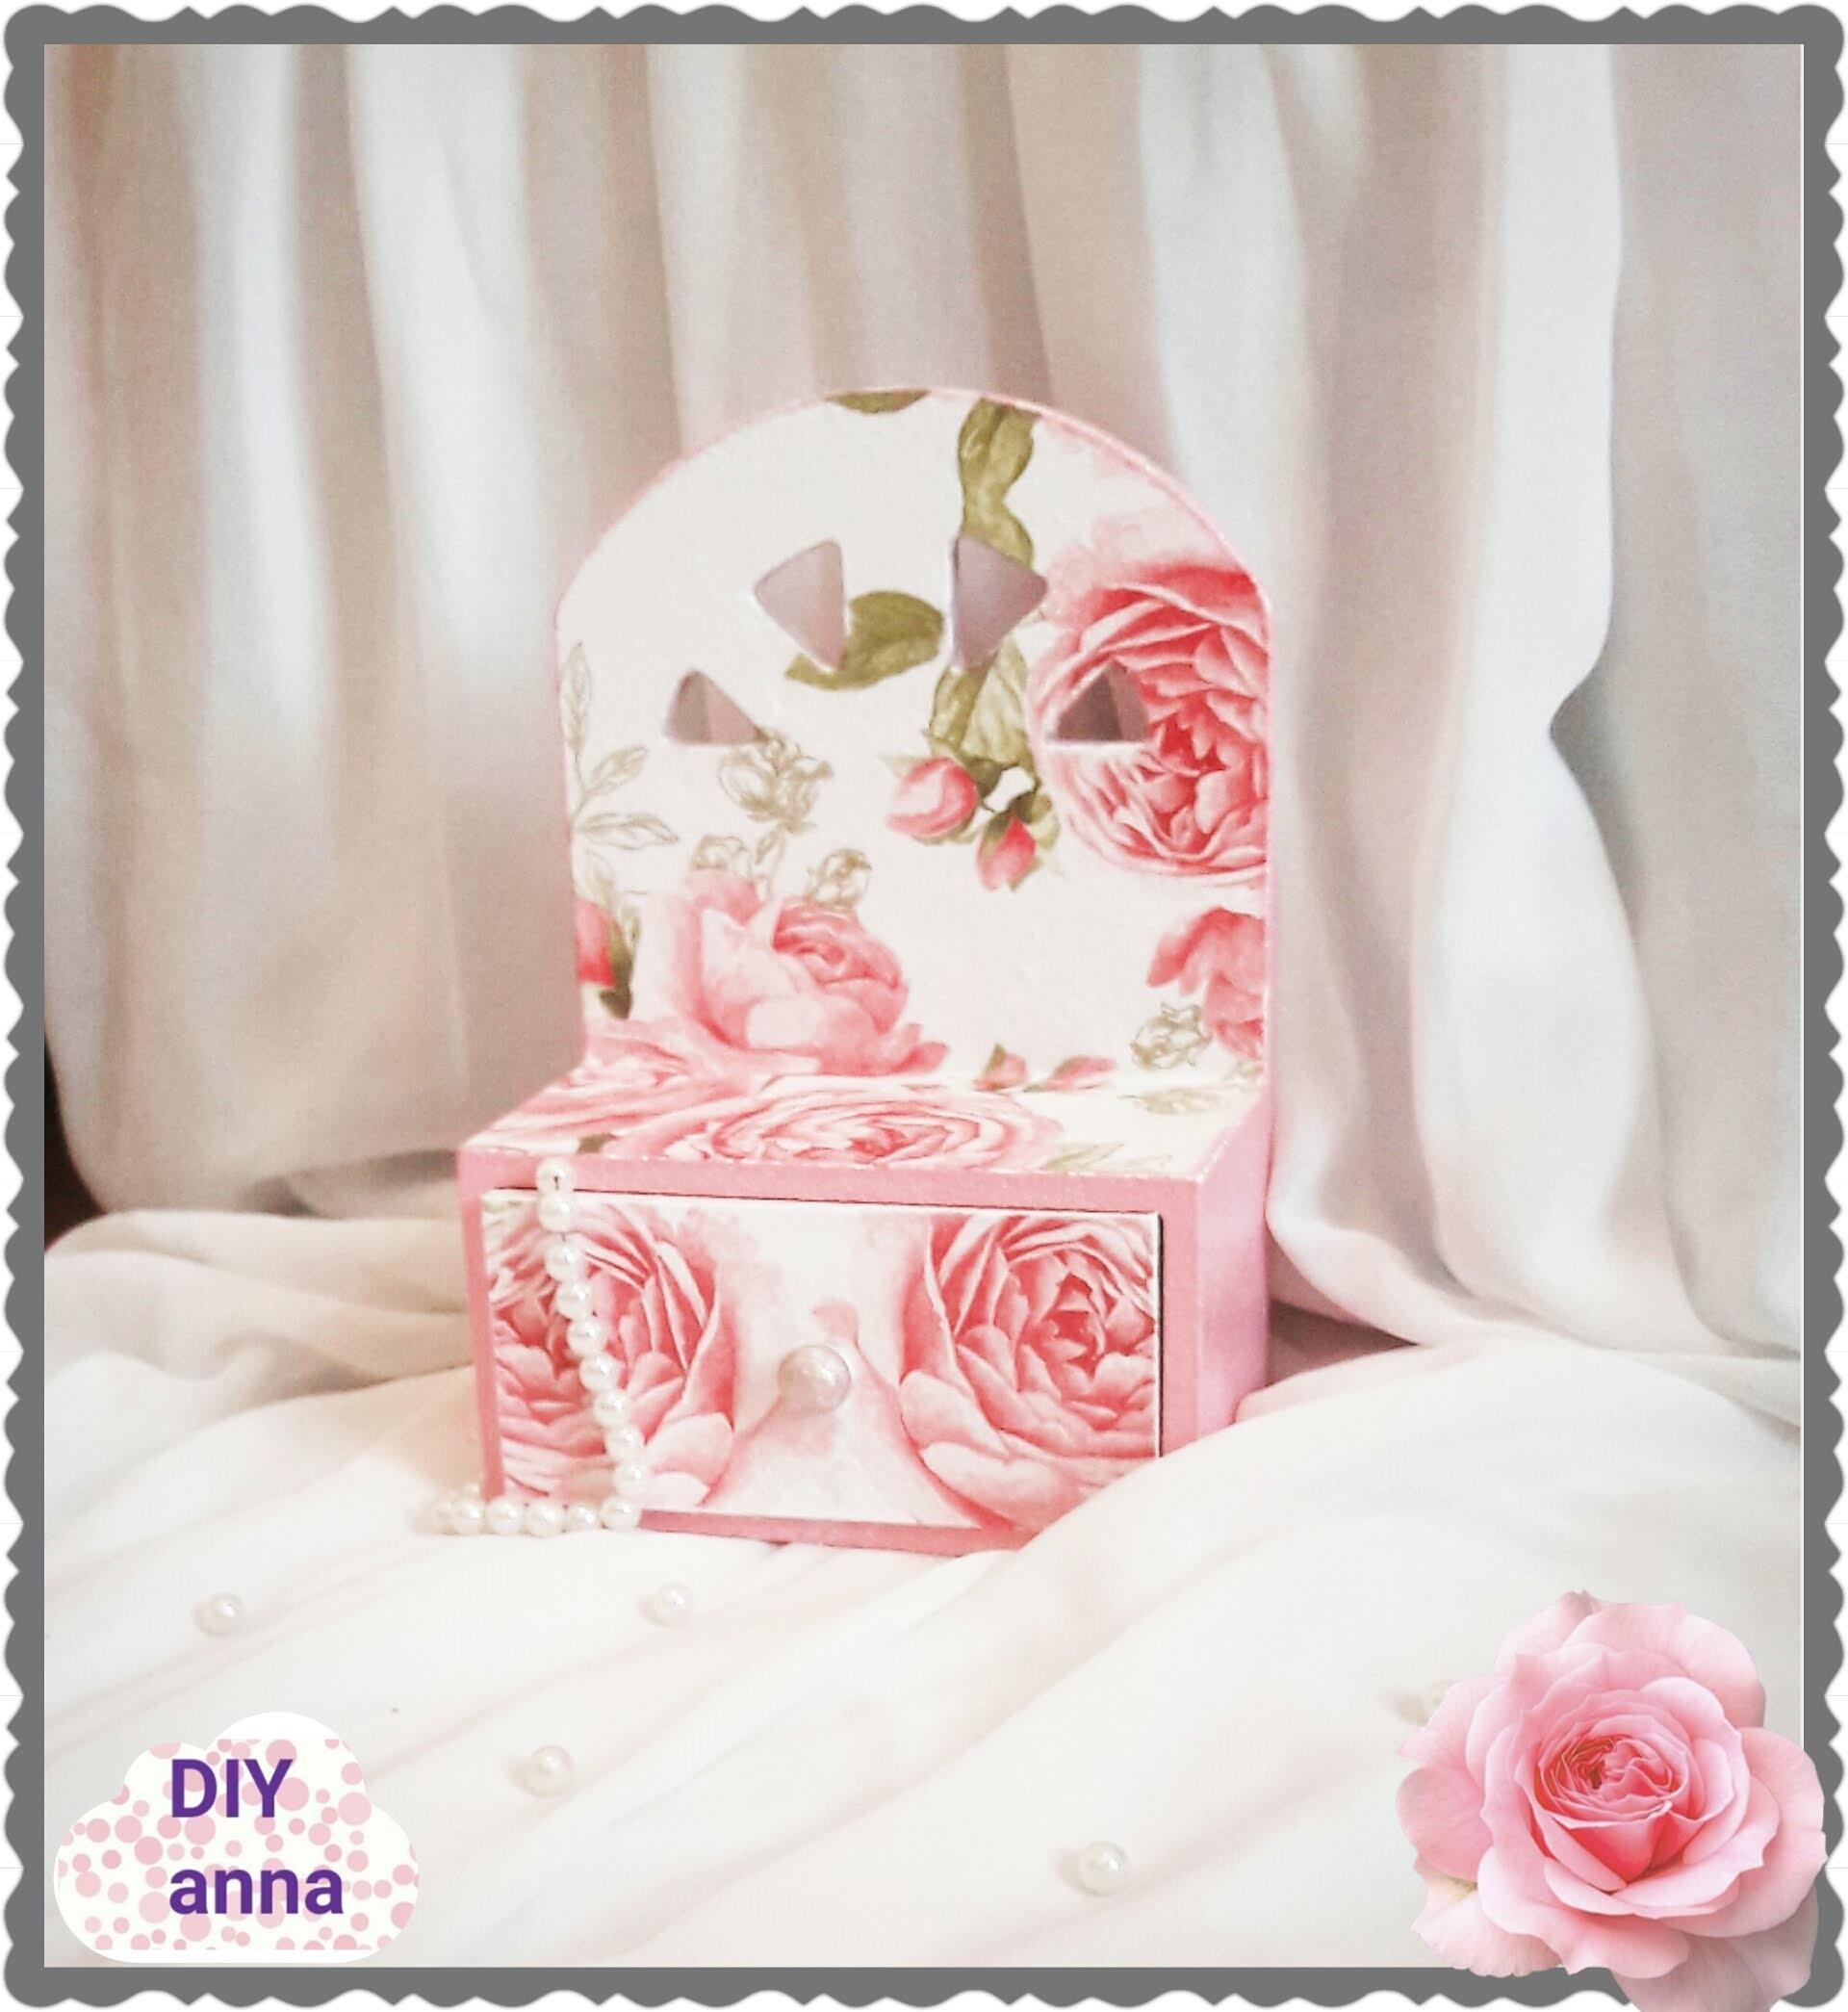 Decoupage romantic  wooden jewelry drawer DIY ideas decorations craft tutorial